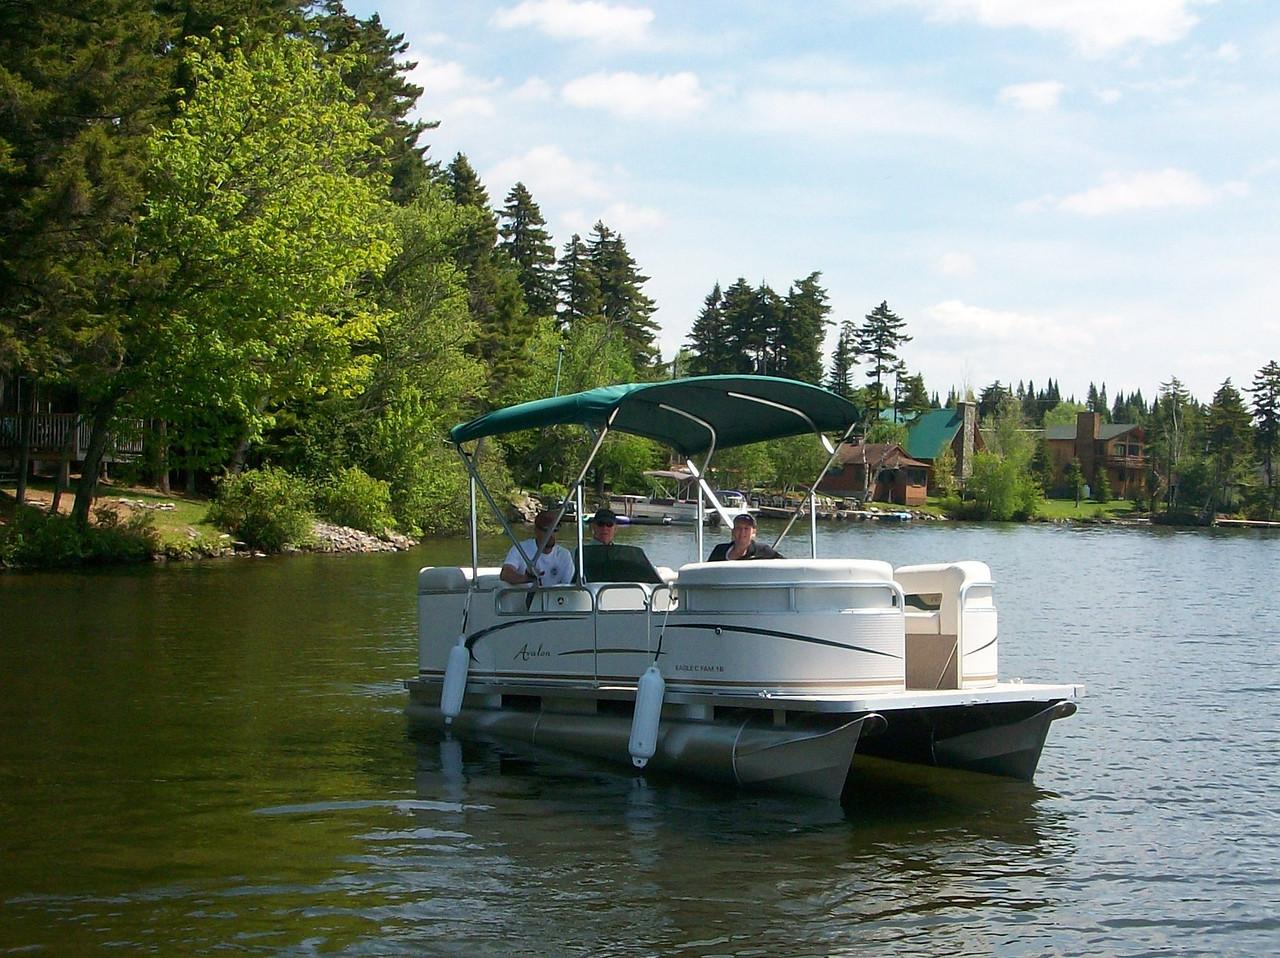 2010 pontoon boat